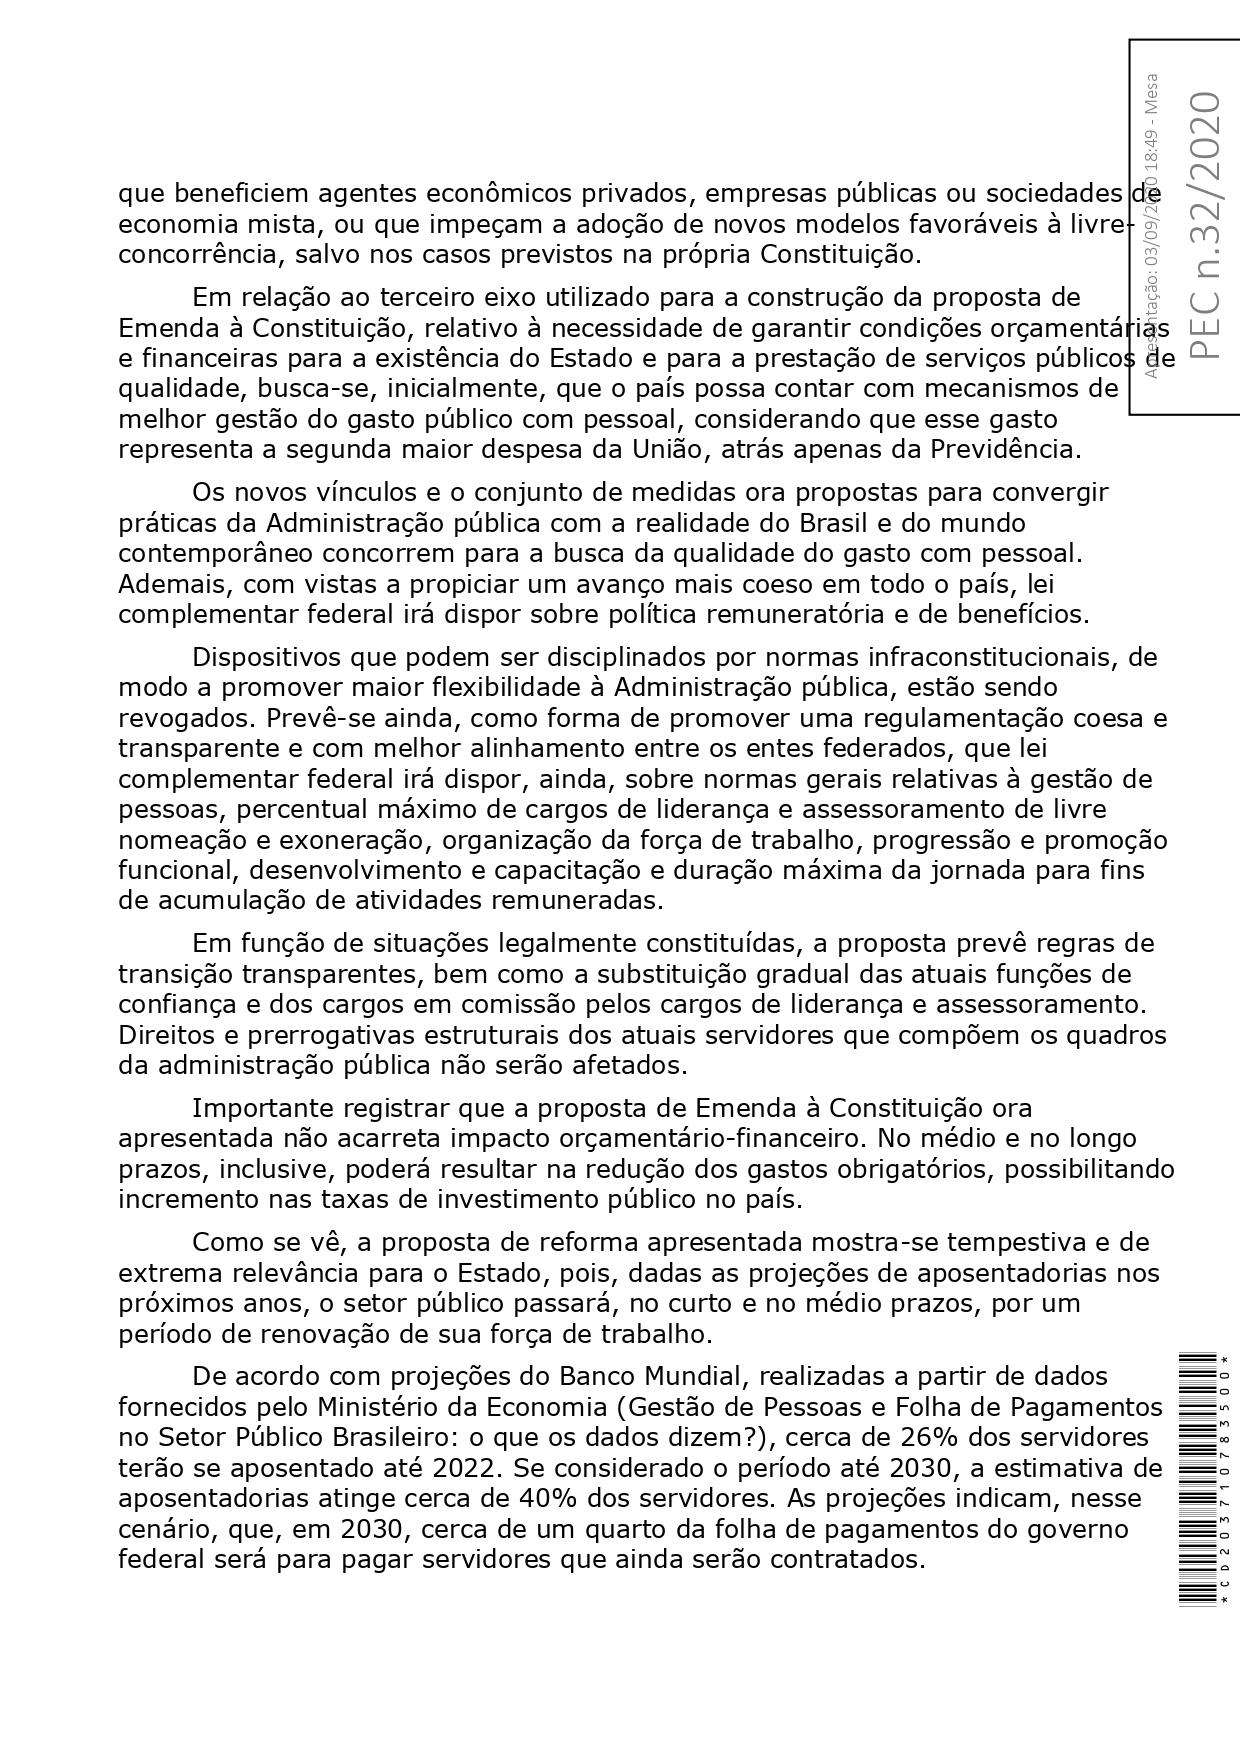 PEC-32-2020_page-0019.jpg